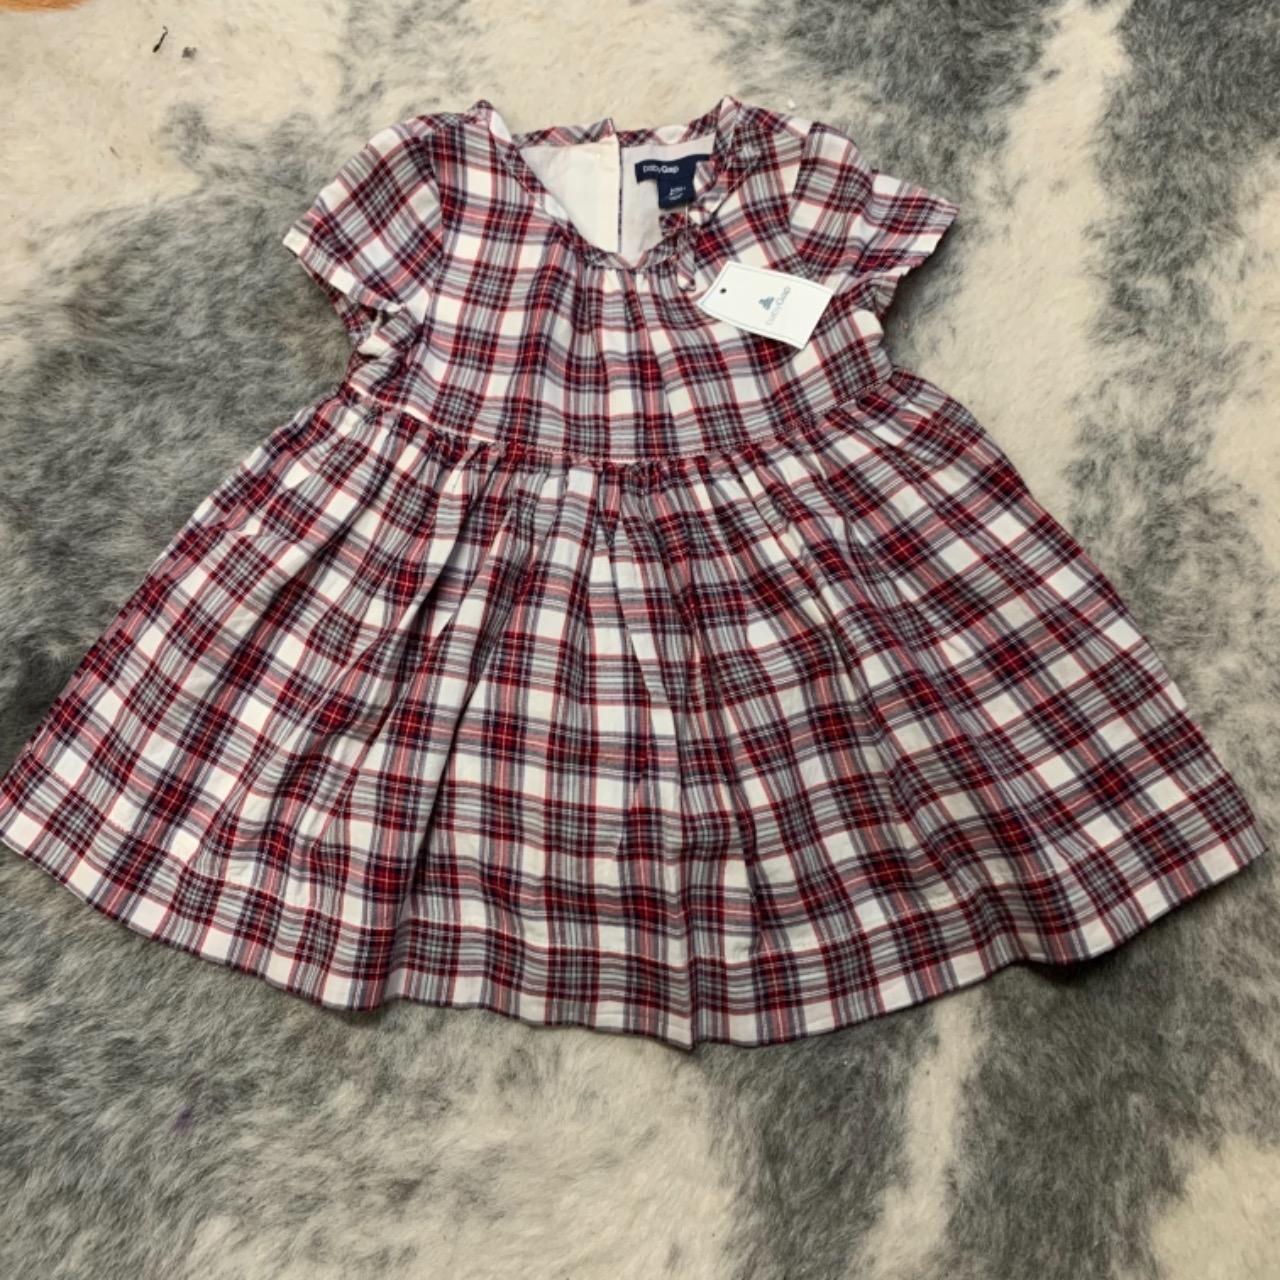 babyGap Kids  Size 1 Dress Red